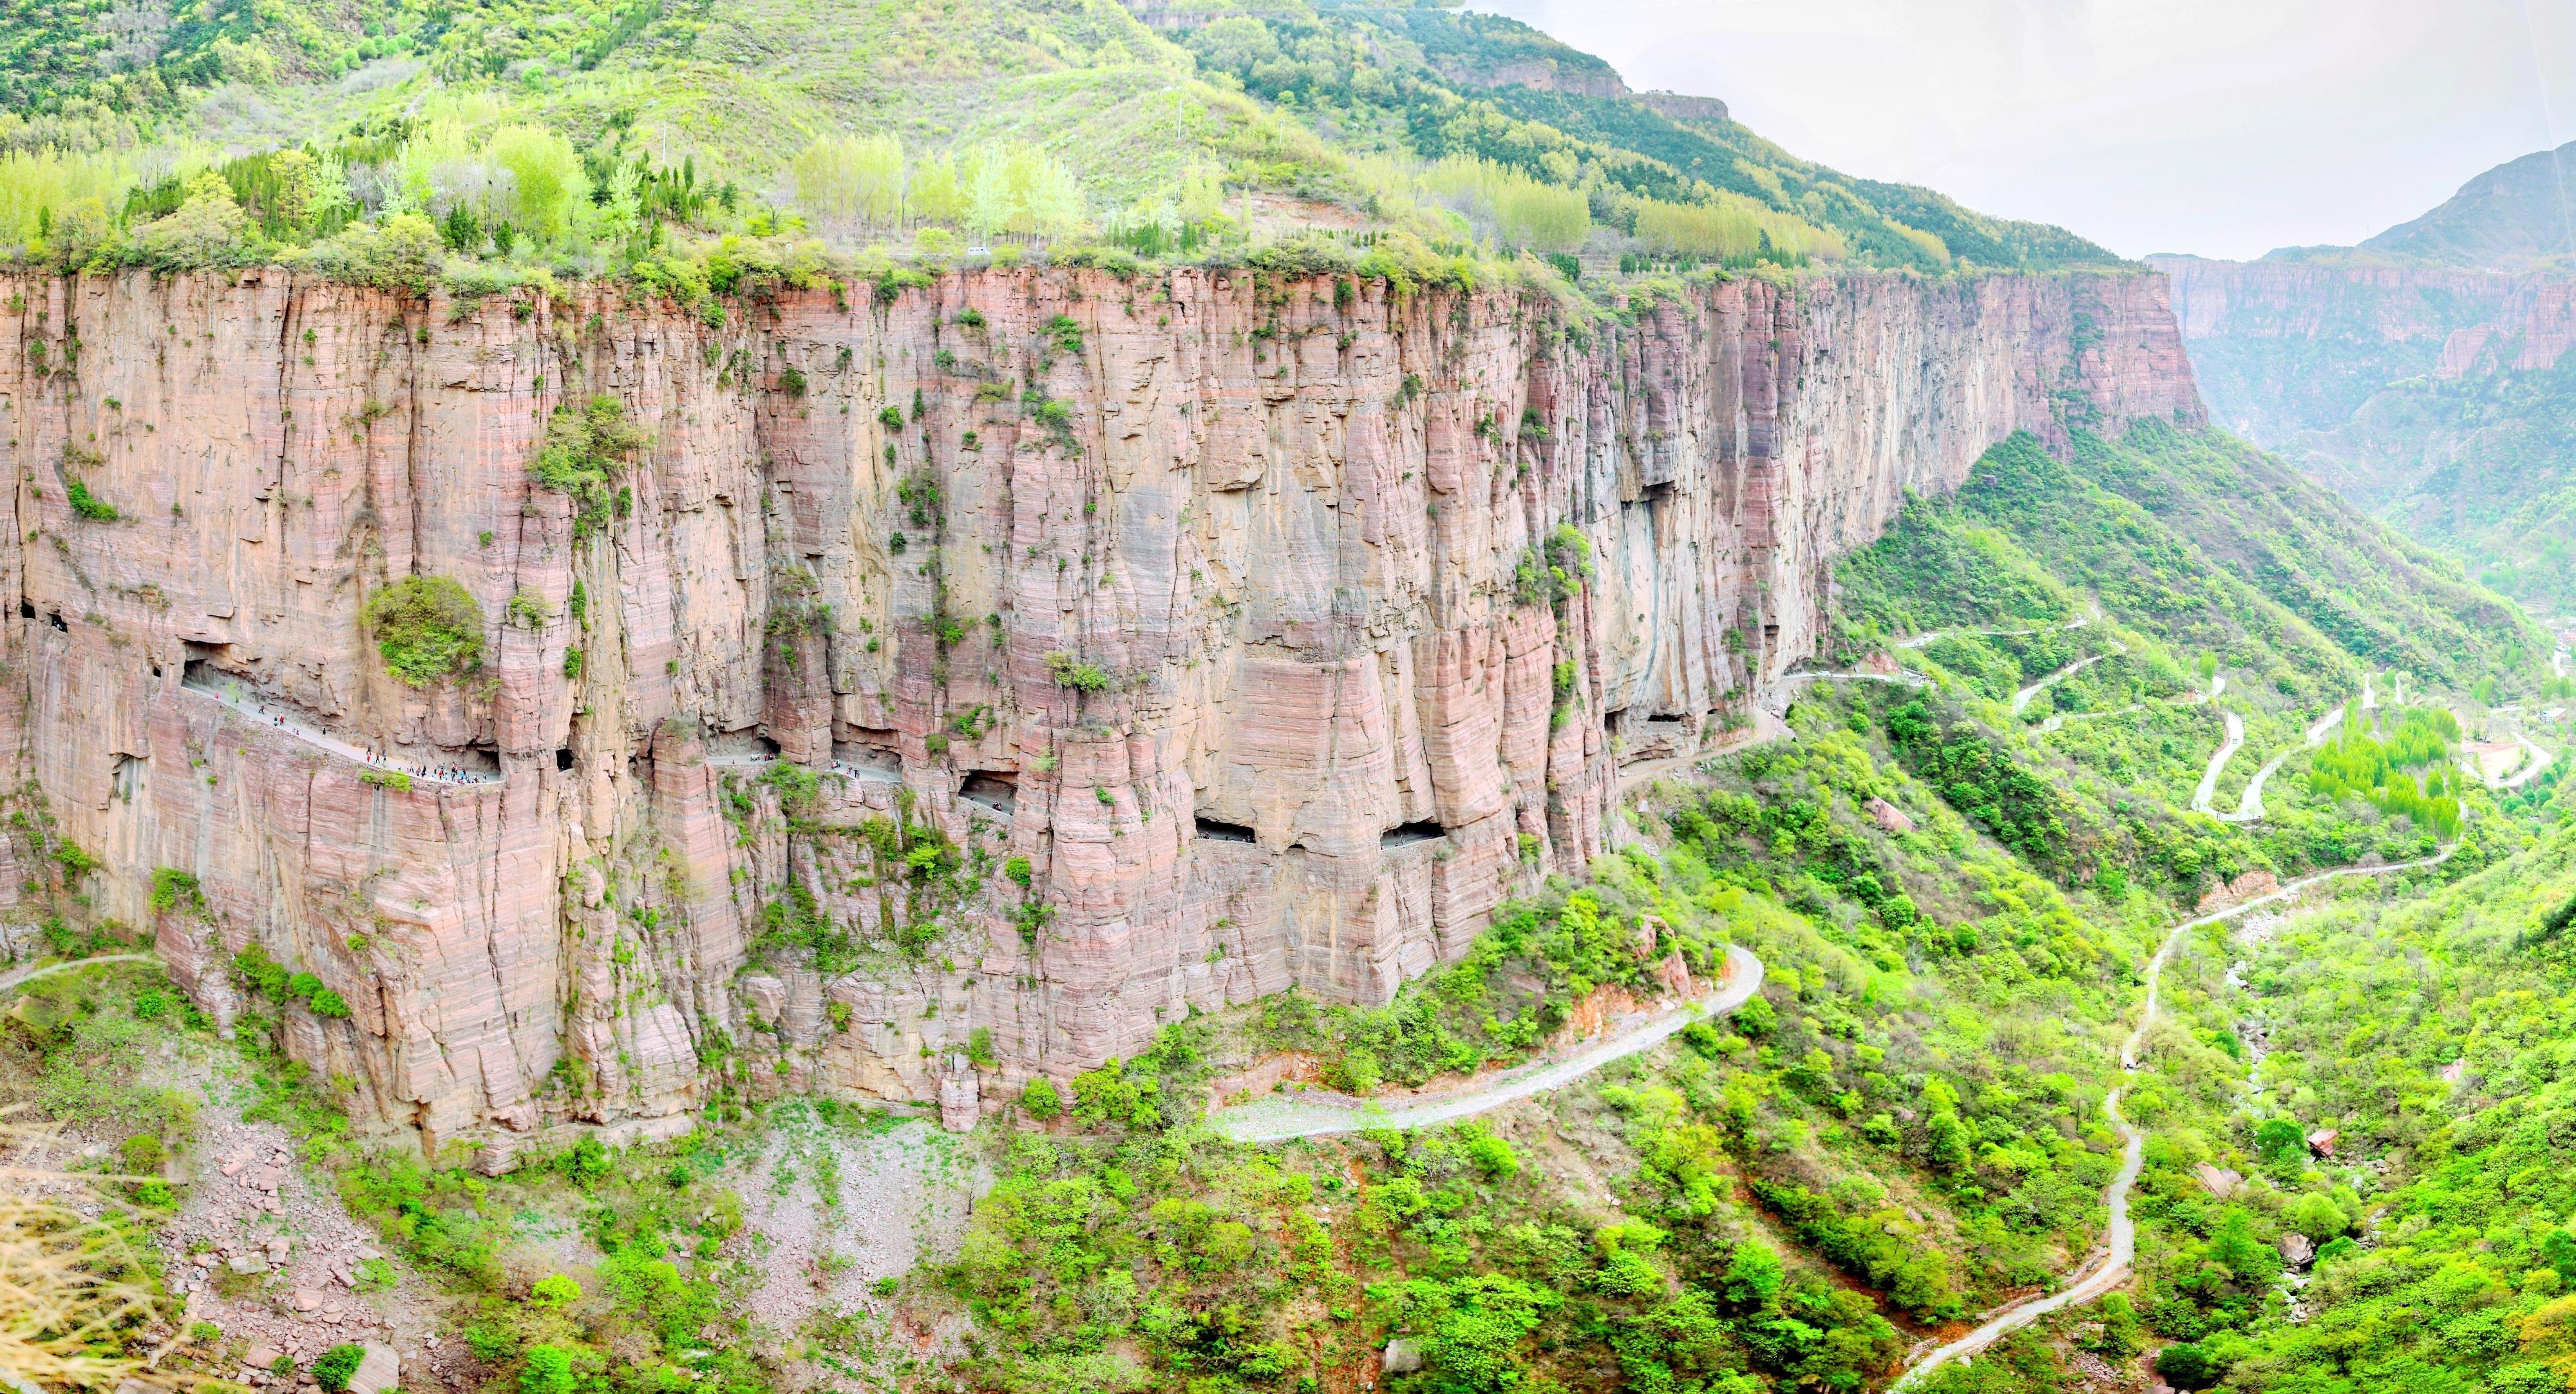 Guoliang Village